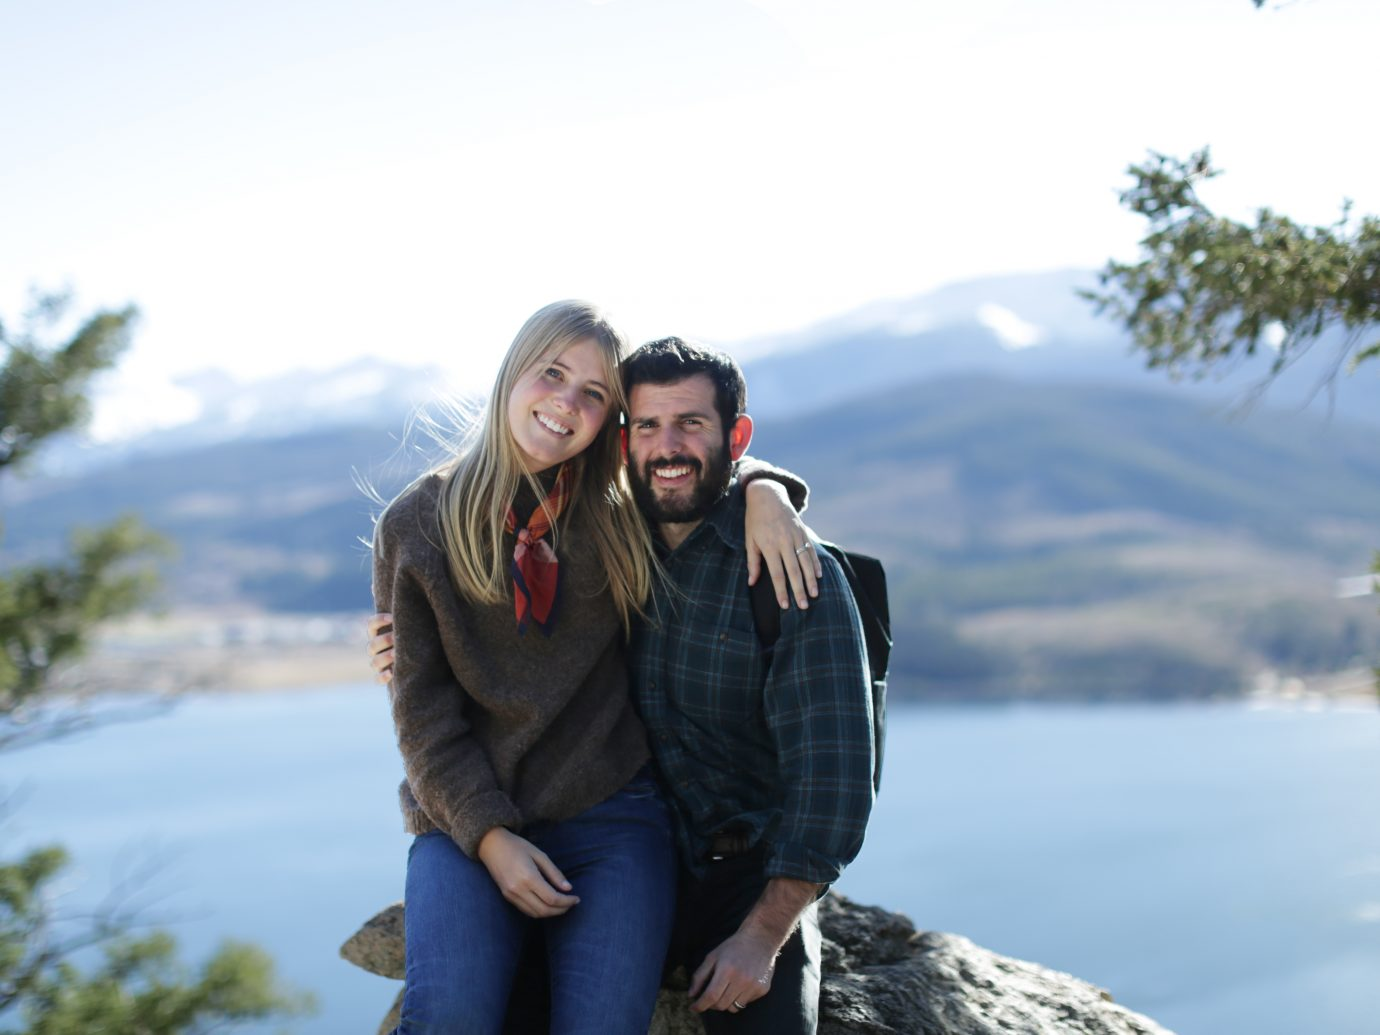 Matilda Sandstroem and Kelly Belknap of Adventurist Backpacks in Denver Colorado